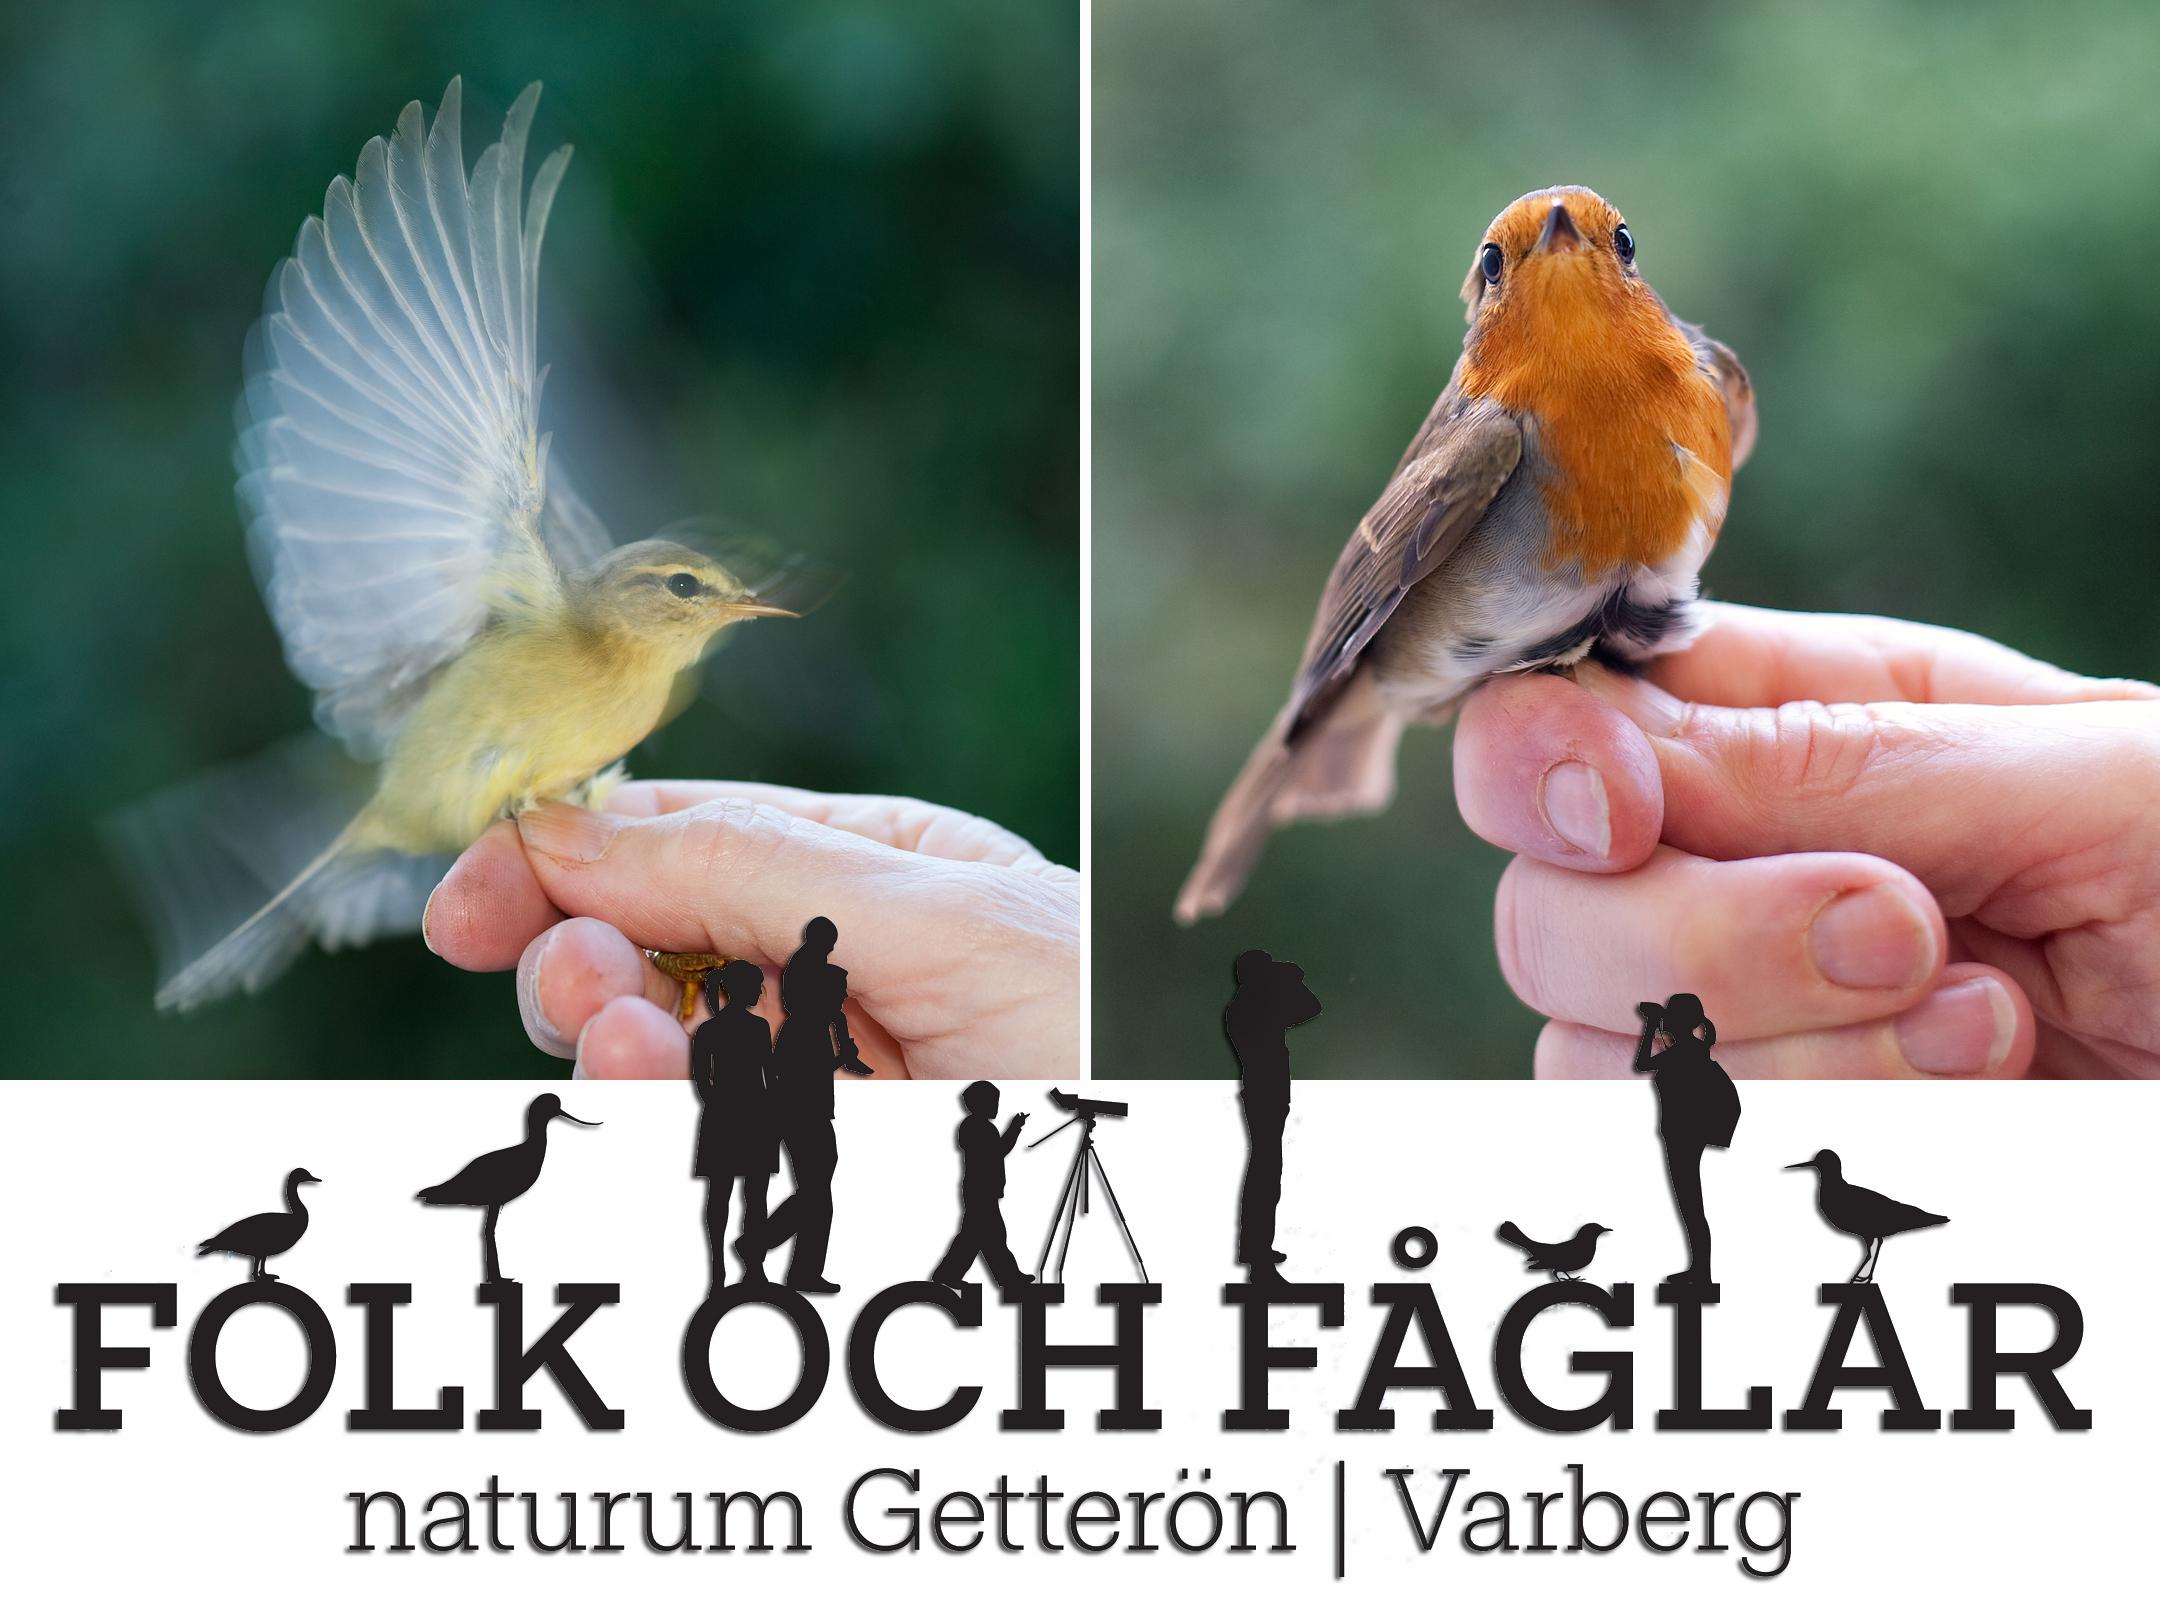 Folk & fåglar